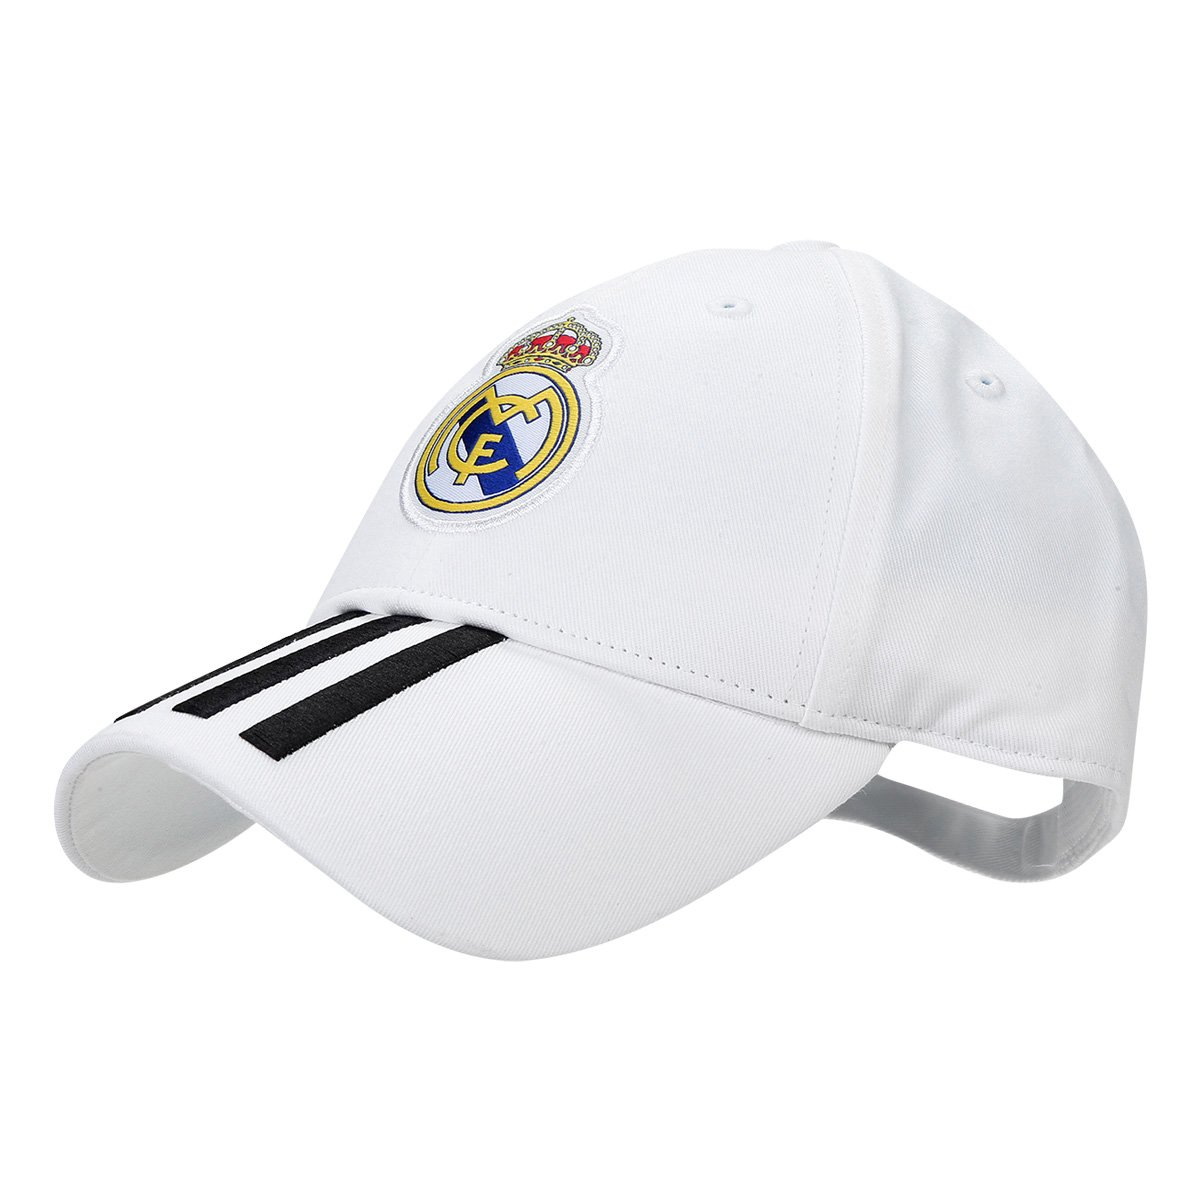 6296106cfc1b5 Boné Adidas Real Madrid 3Stripes Aba Curva | Allianz Parque Shop